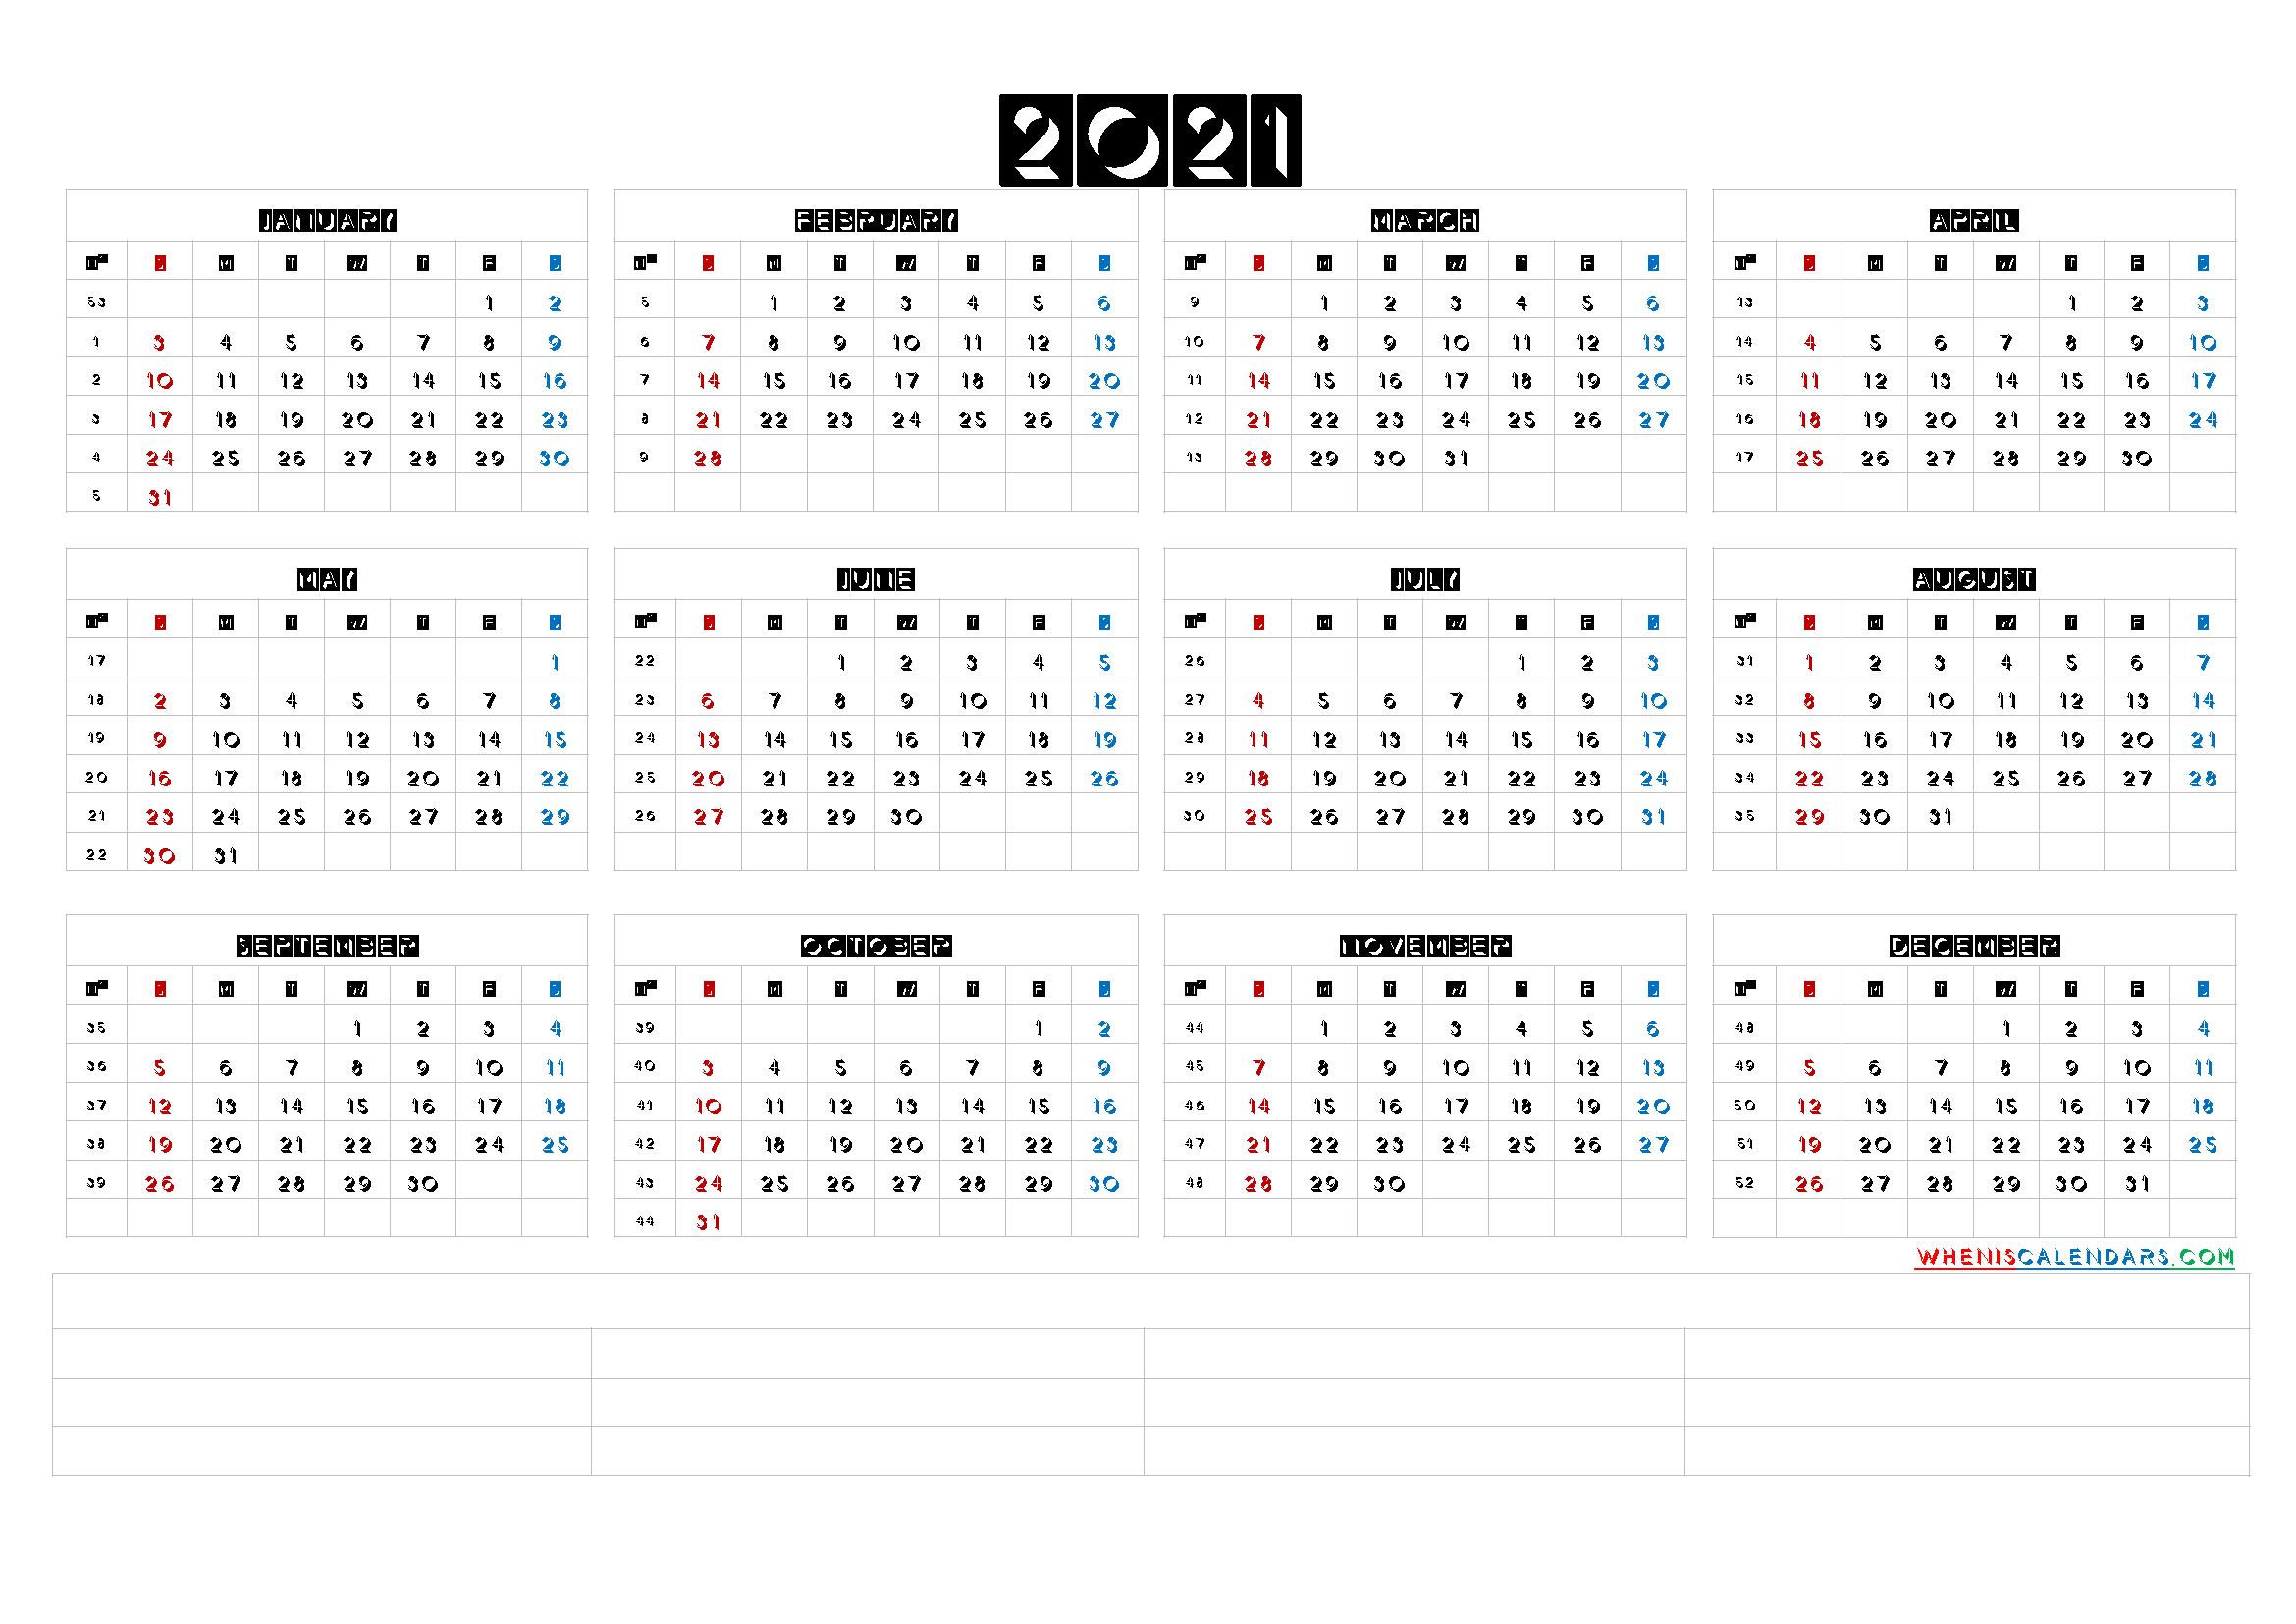 Free Printable 2021 Yearly Calendar With Week Numbers 6 1